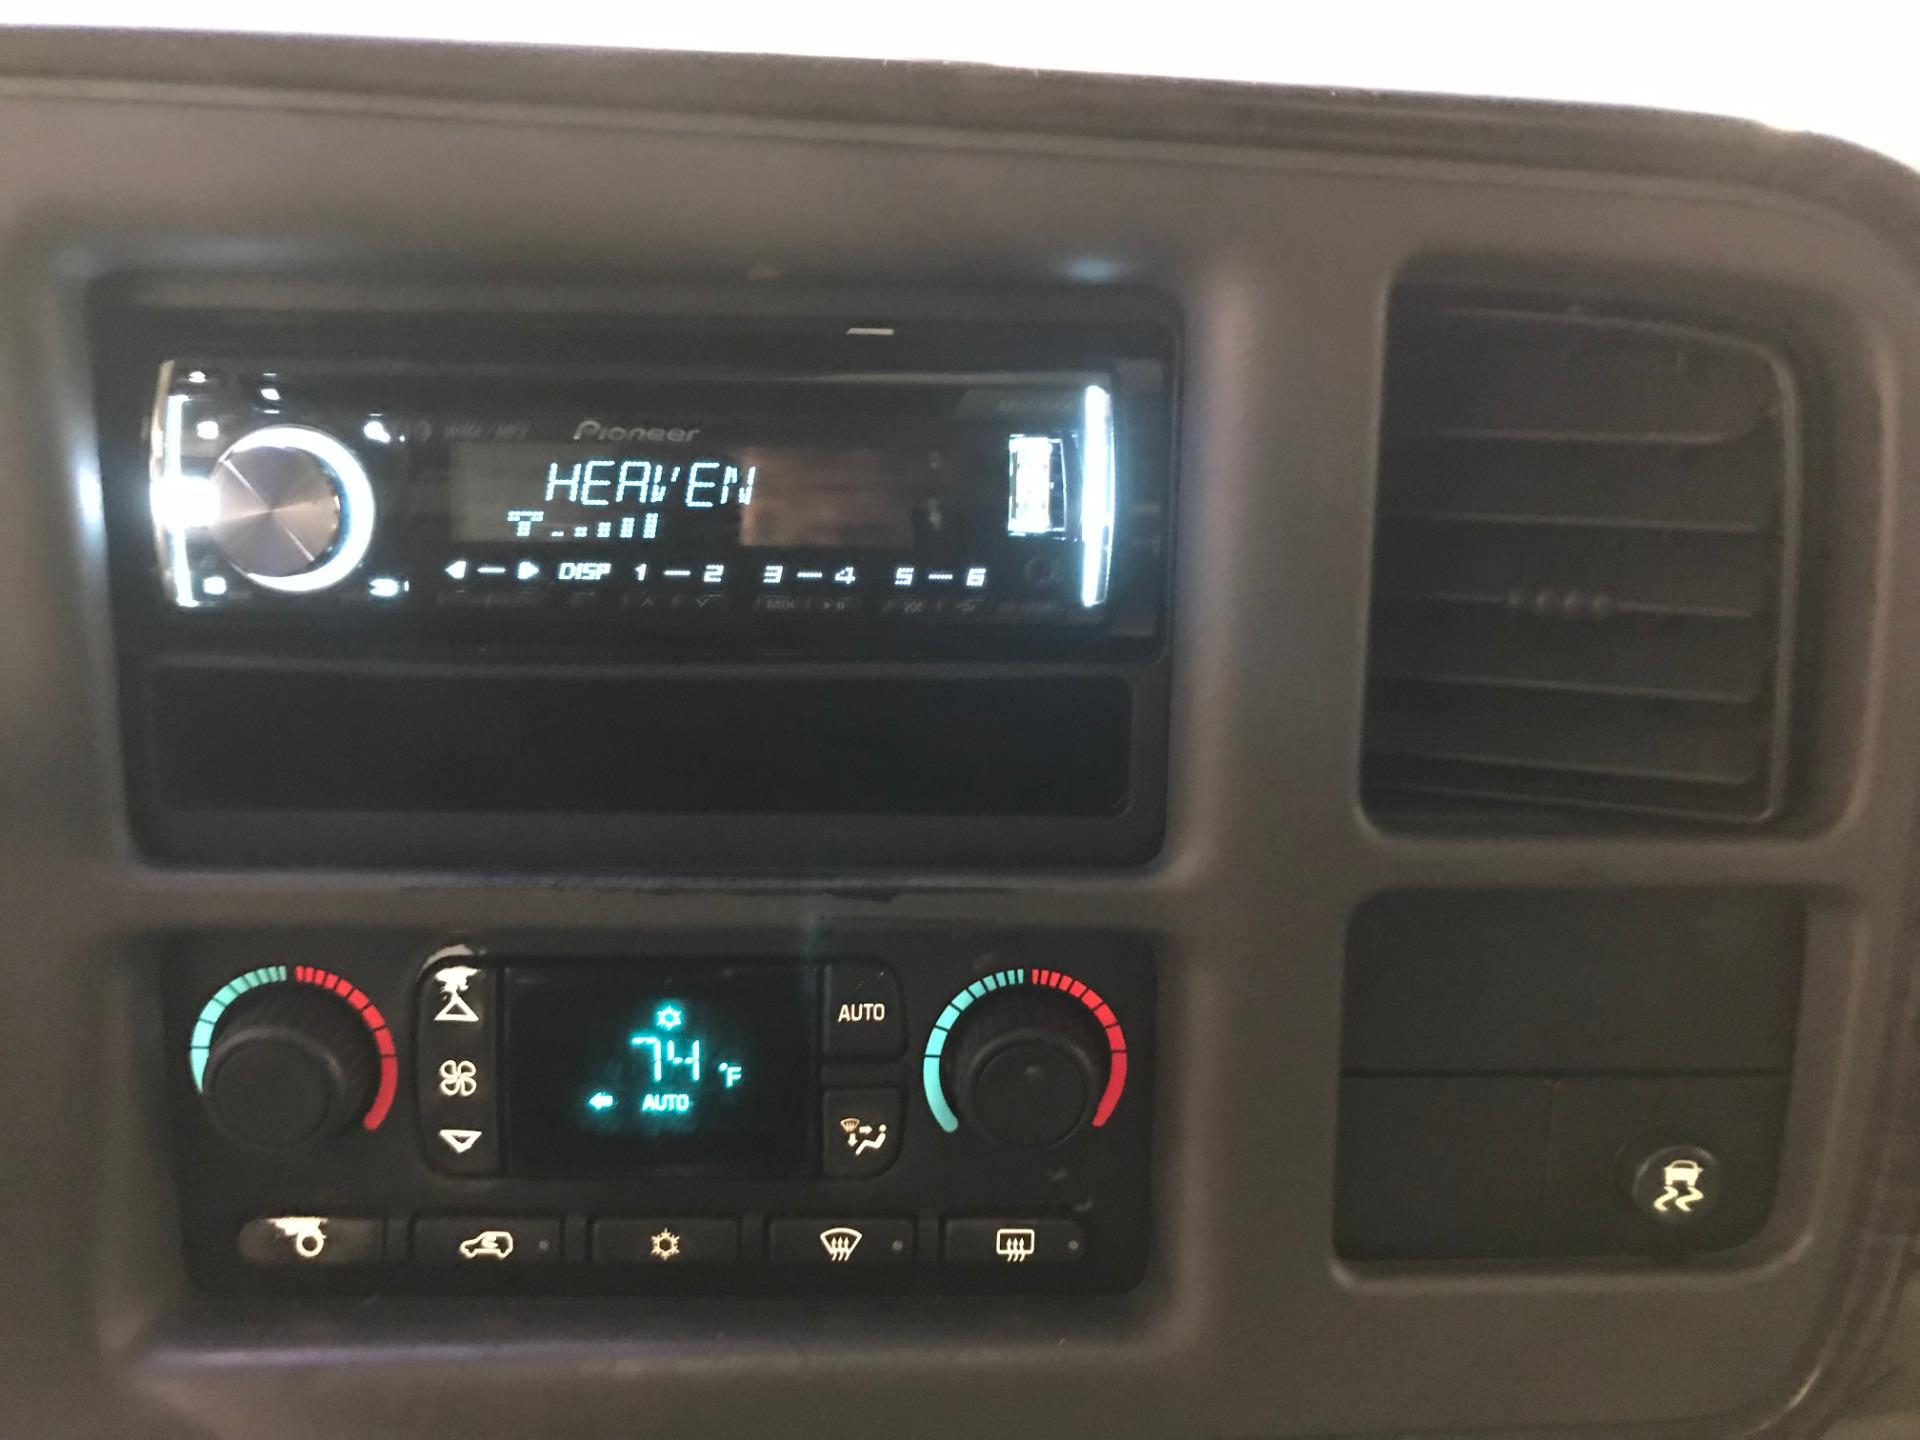 Used-2004-GMC-Yukon-Denali-AWD-Limited-Edition